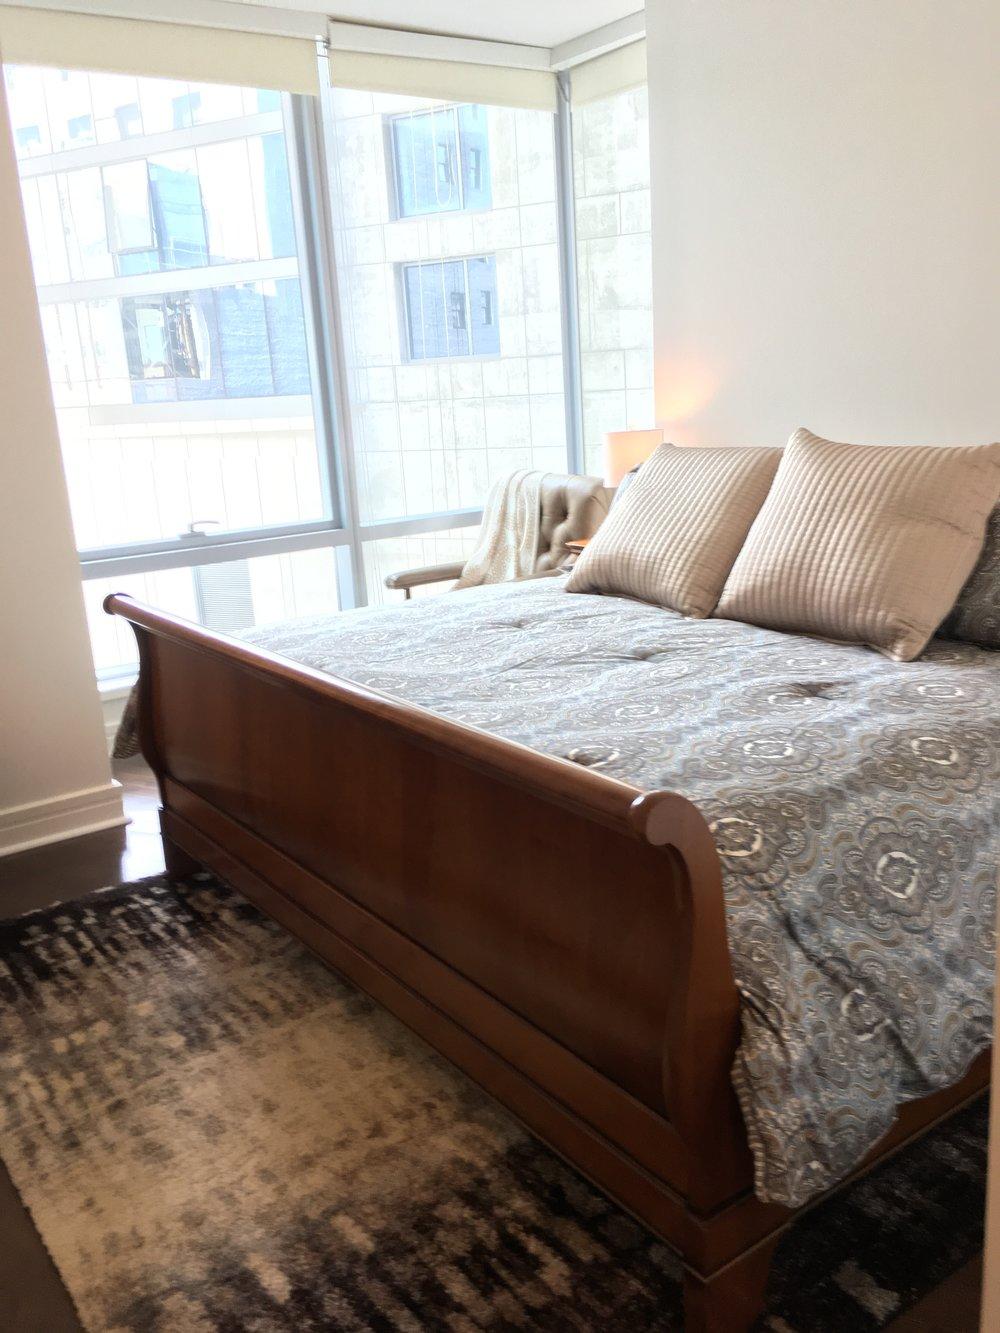 Philadelphia Luxury Home Condo-the ritz carlton residences 15A bryant wilde realty13.JPG